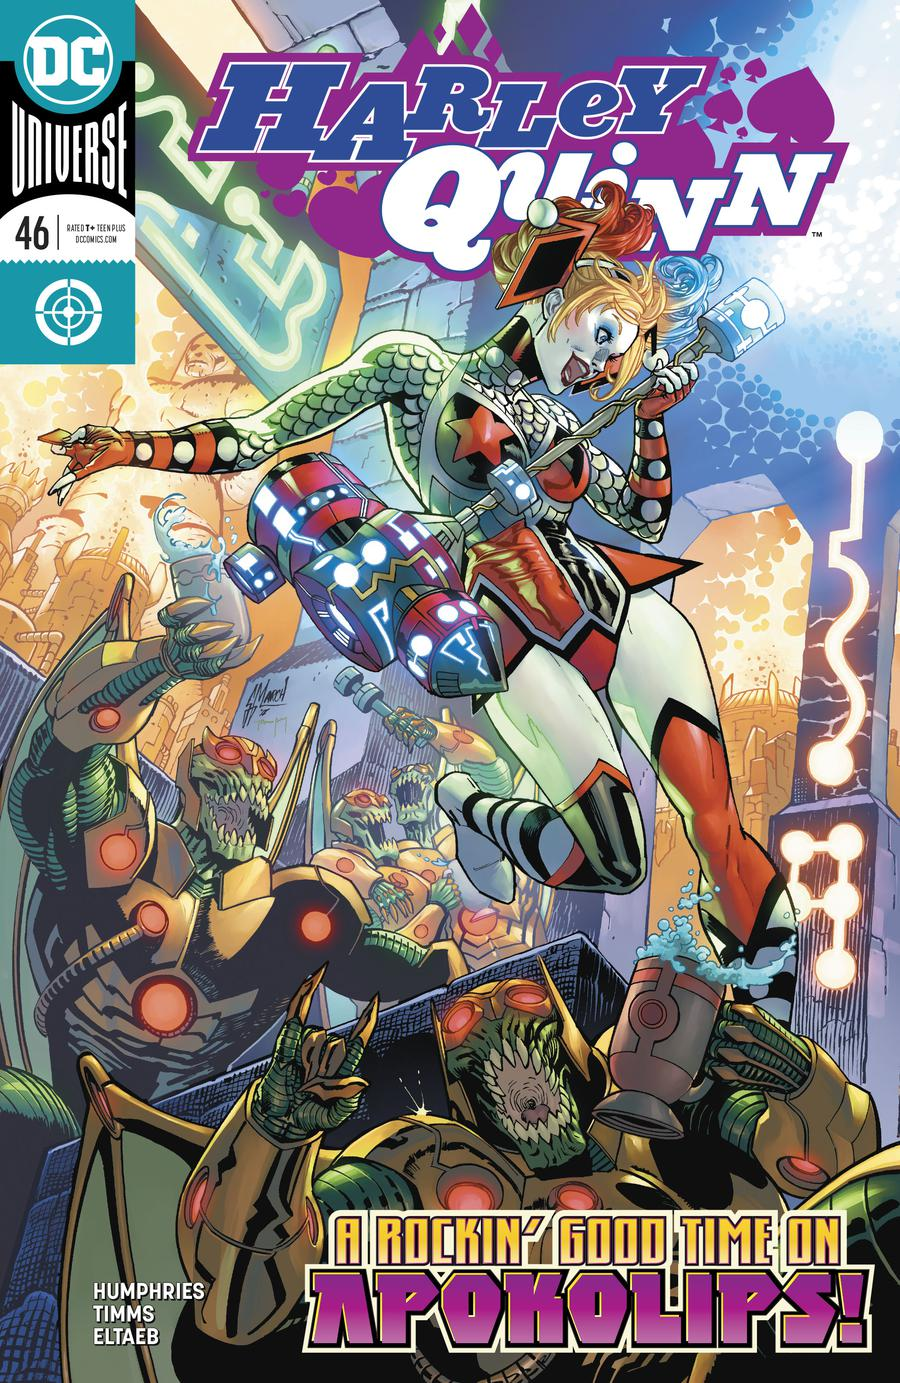 Harley Quinn Vol 3 #46 Cover A Regular Guillem March Cover